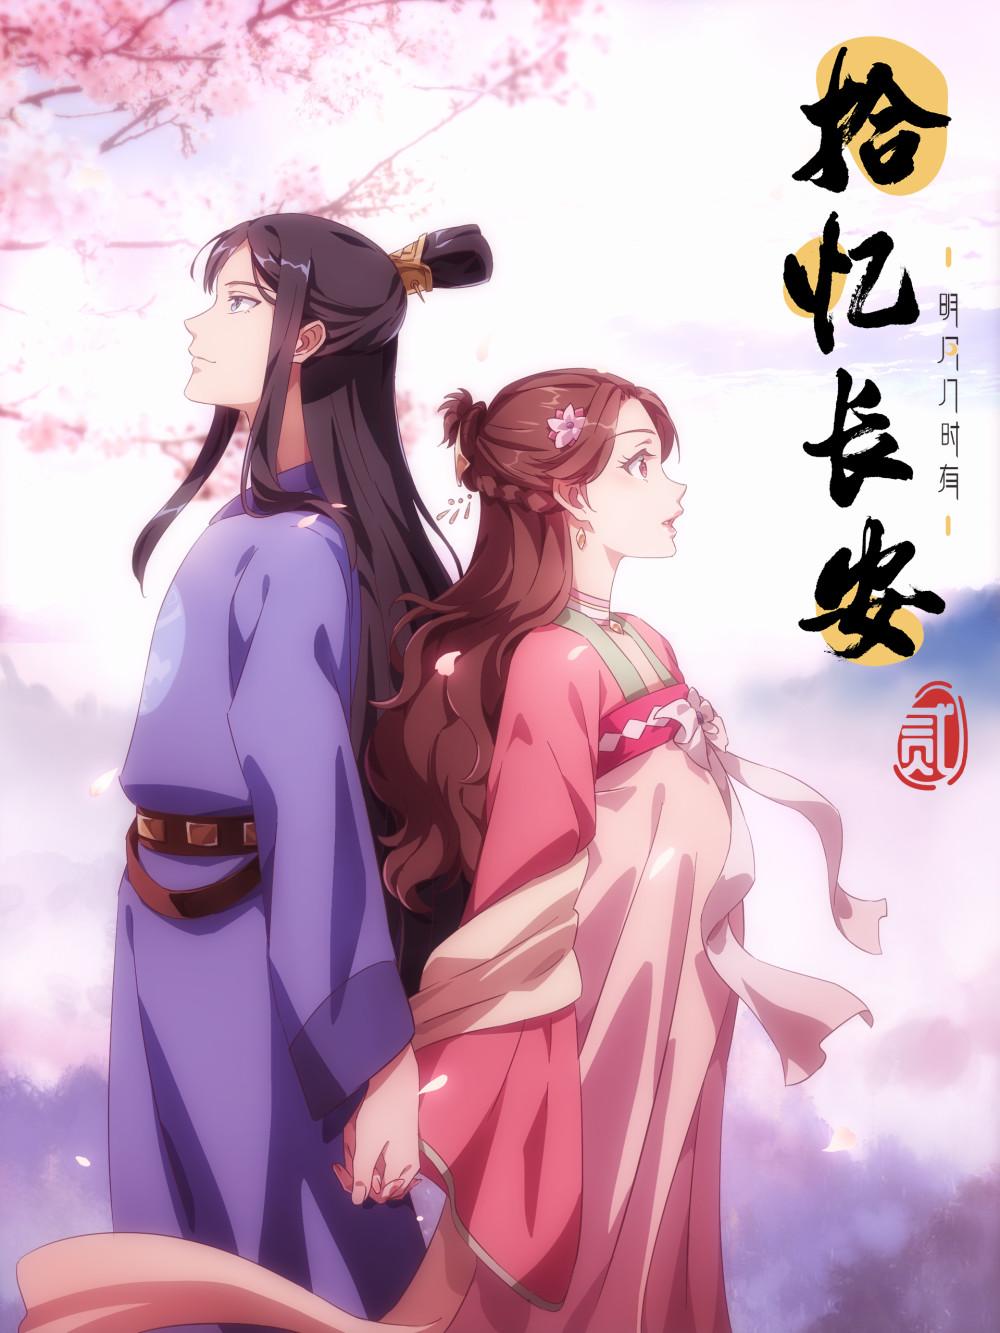 [国漫][拾忆少安·明月几时有 第2季][Shi Yi Chang An:Ming Yue Ji Shi You Ⅱ][2021][01-12 Fin+SP][AVC][GB][1080P][GM-Team]_1